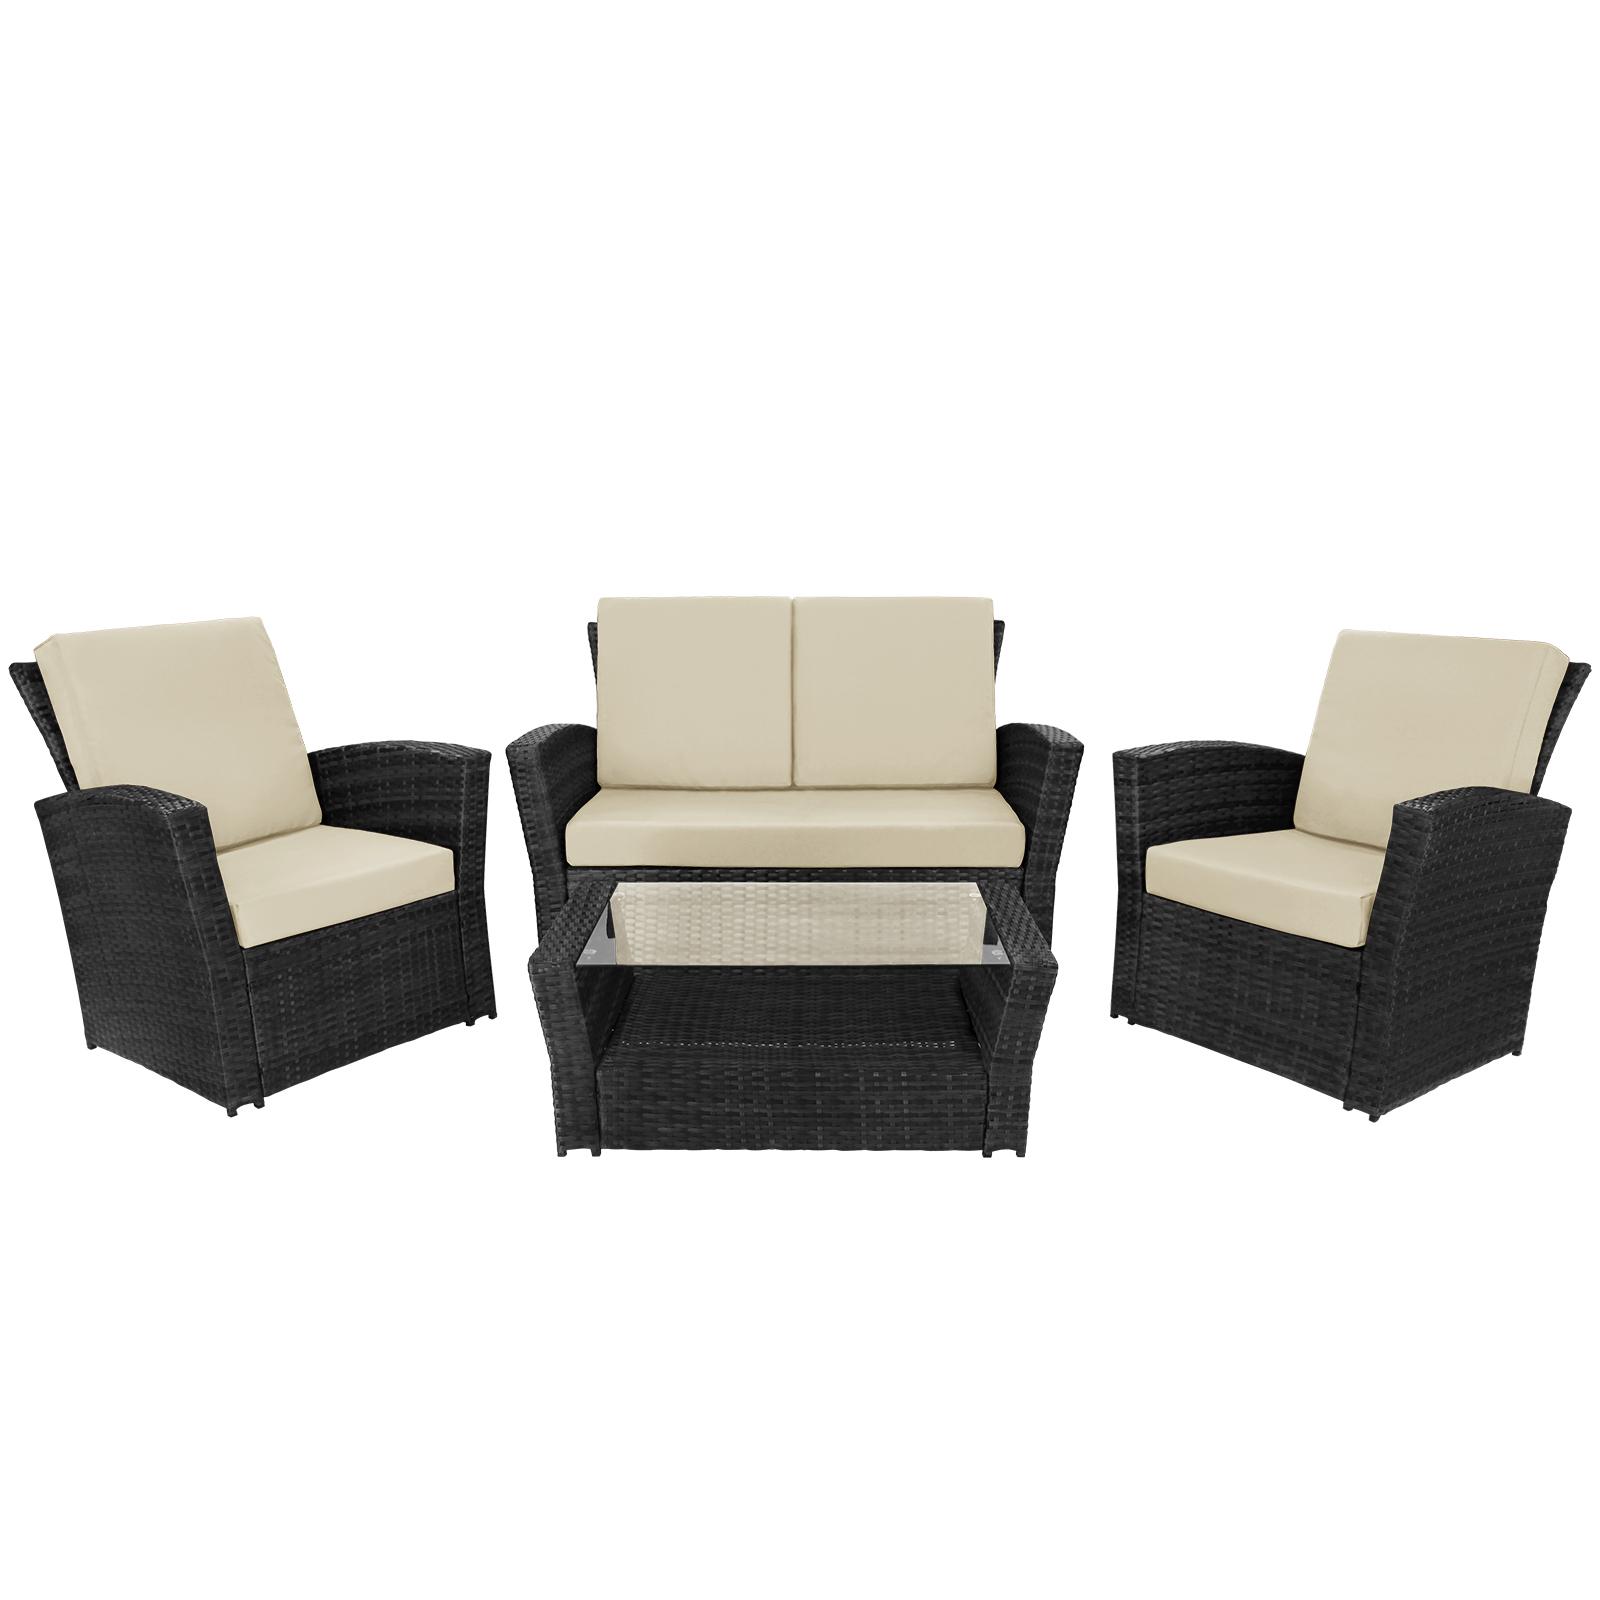 10 teilige polyrattan sitzgruppe lounge rio deluxe von bb. Black Bedroom Furniture Sets. Home Design Ideas